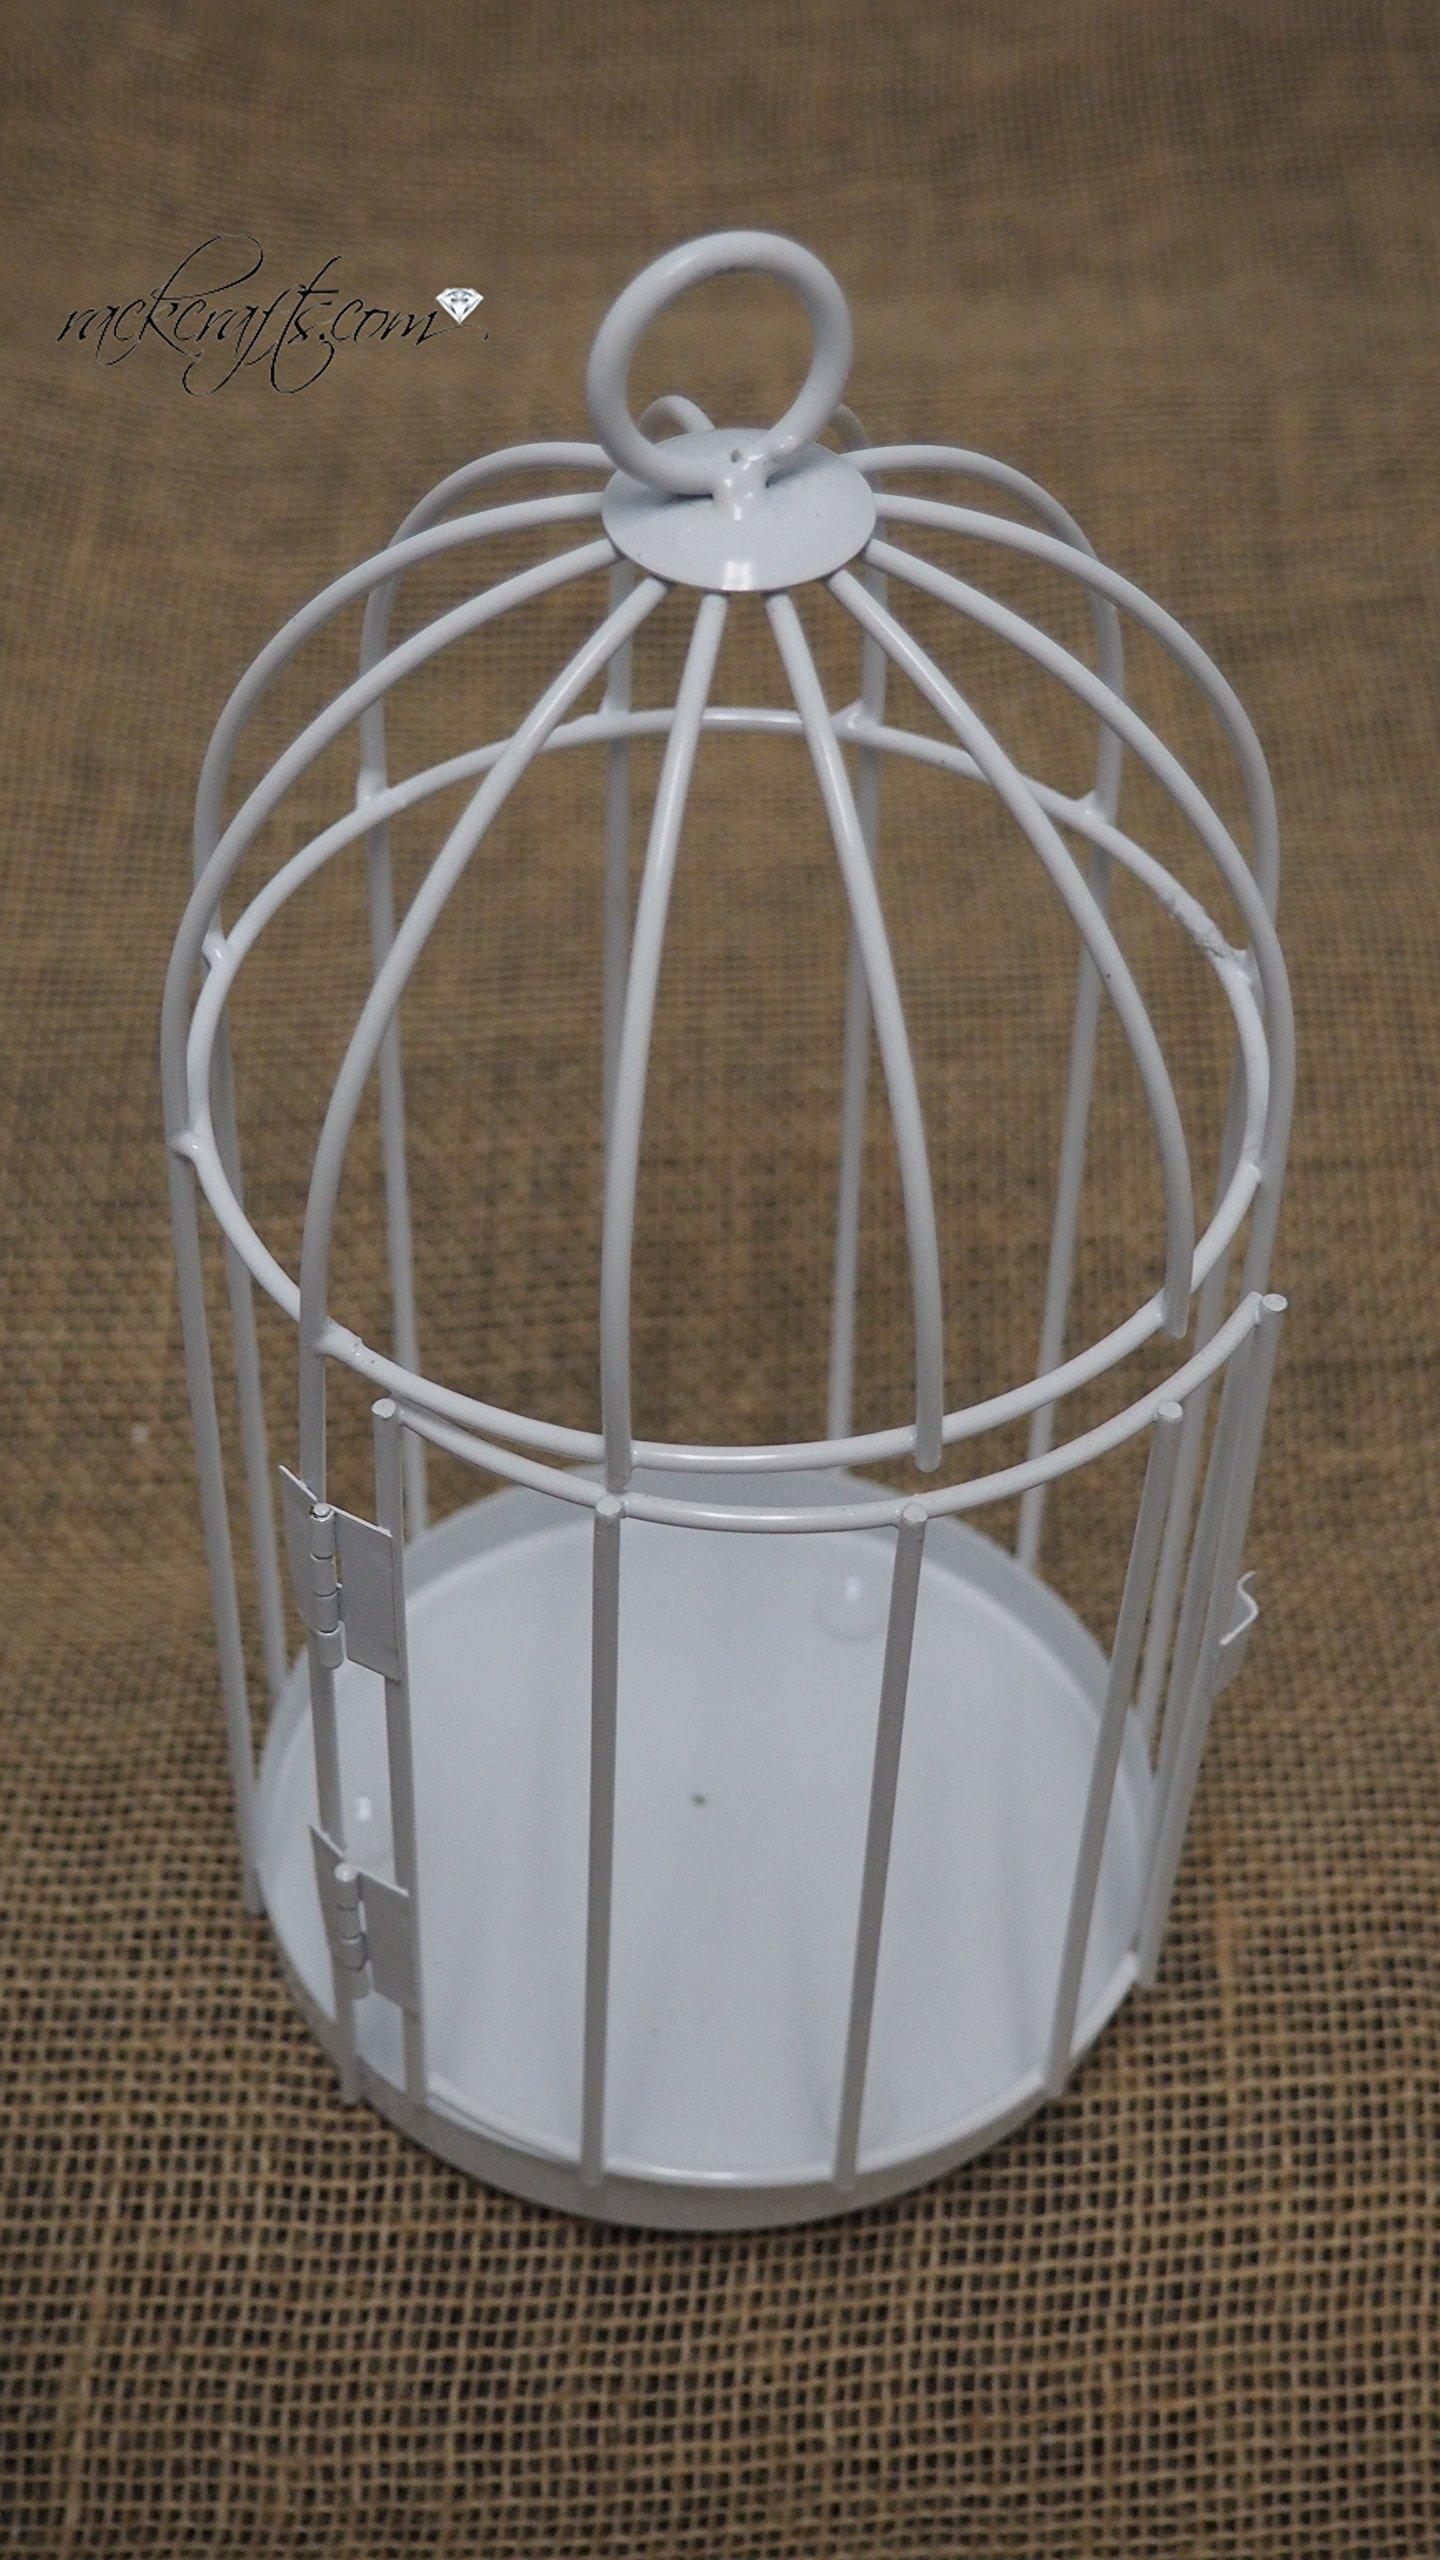 rackcrafts.com Mini Small Wedding Anniversary Bird Cage Cake Topper Garden Home Decor